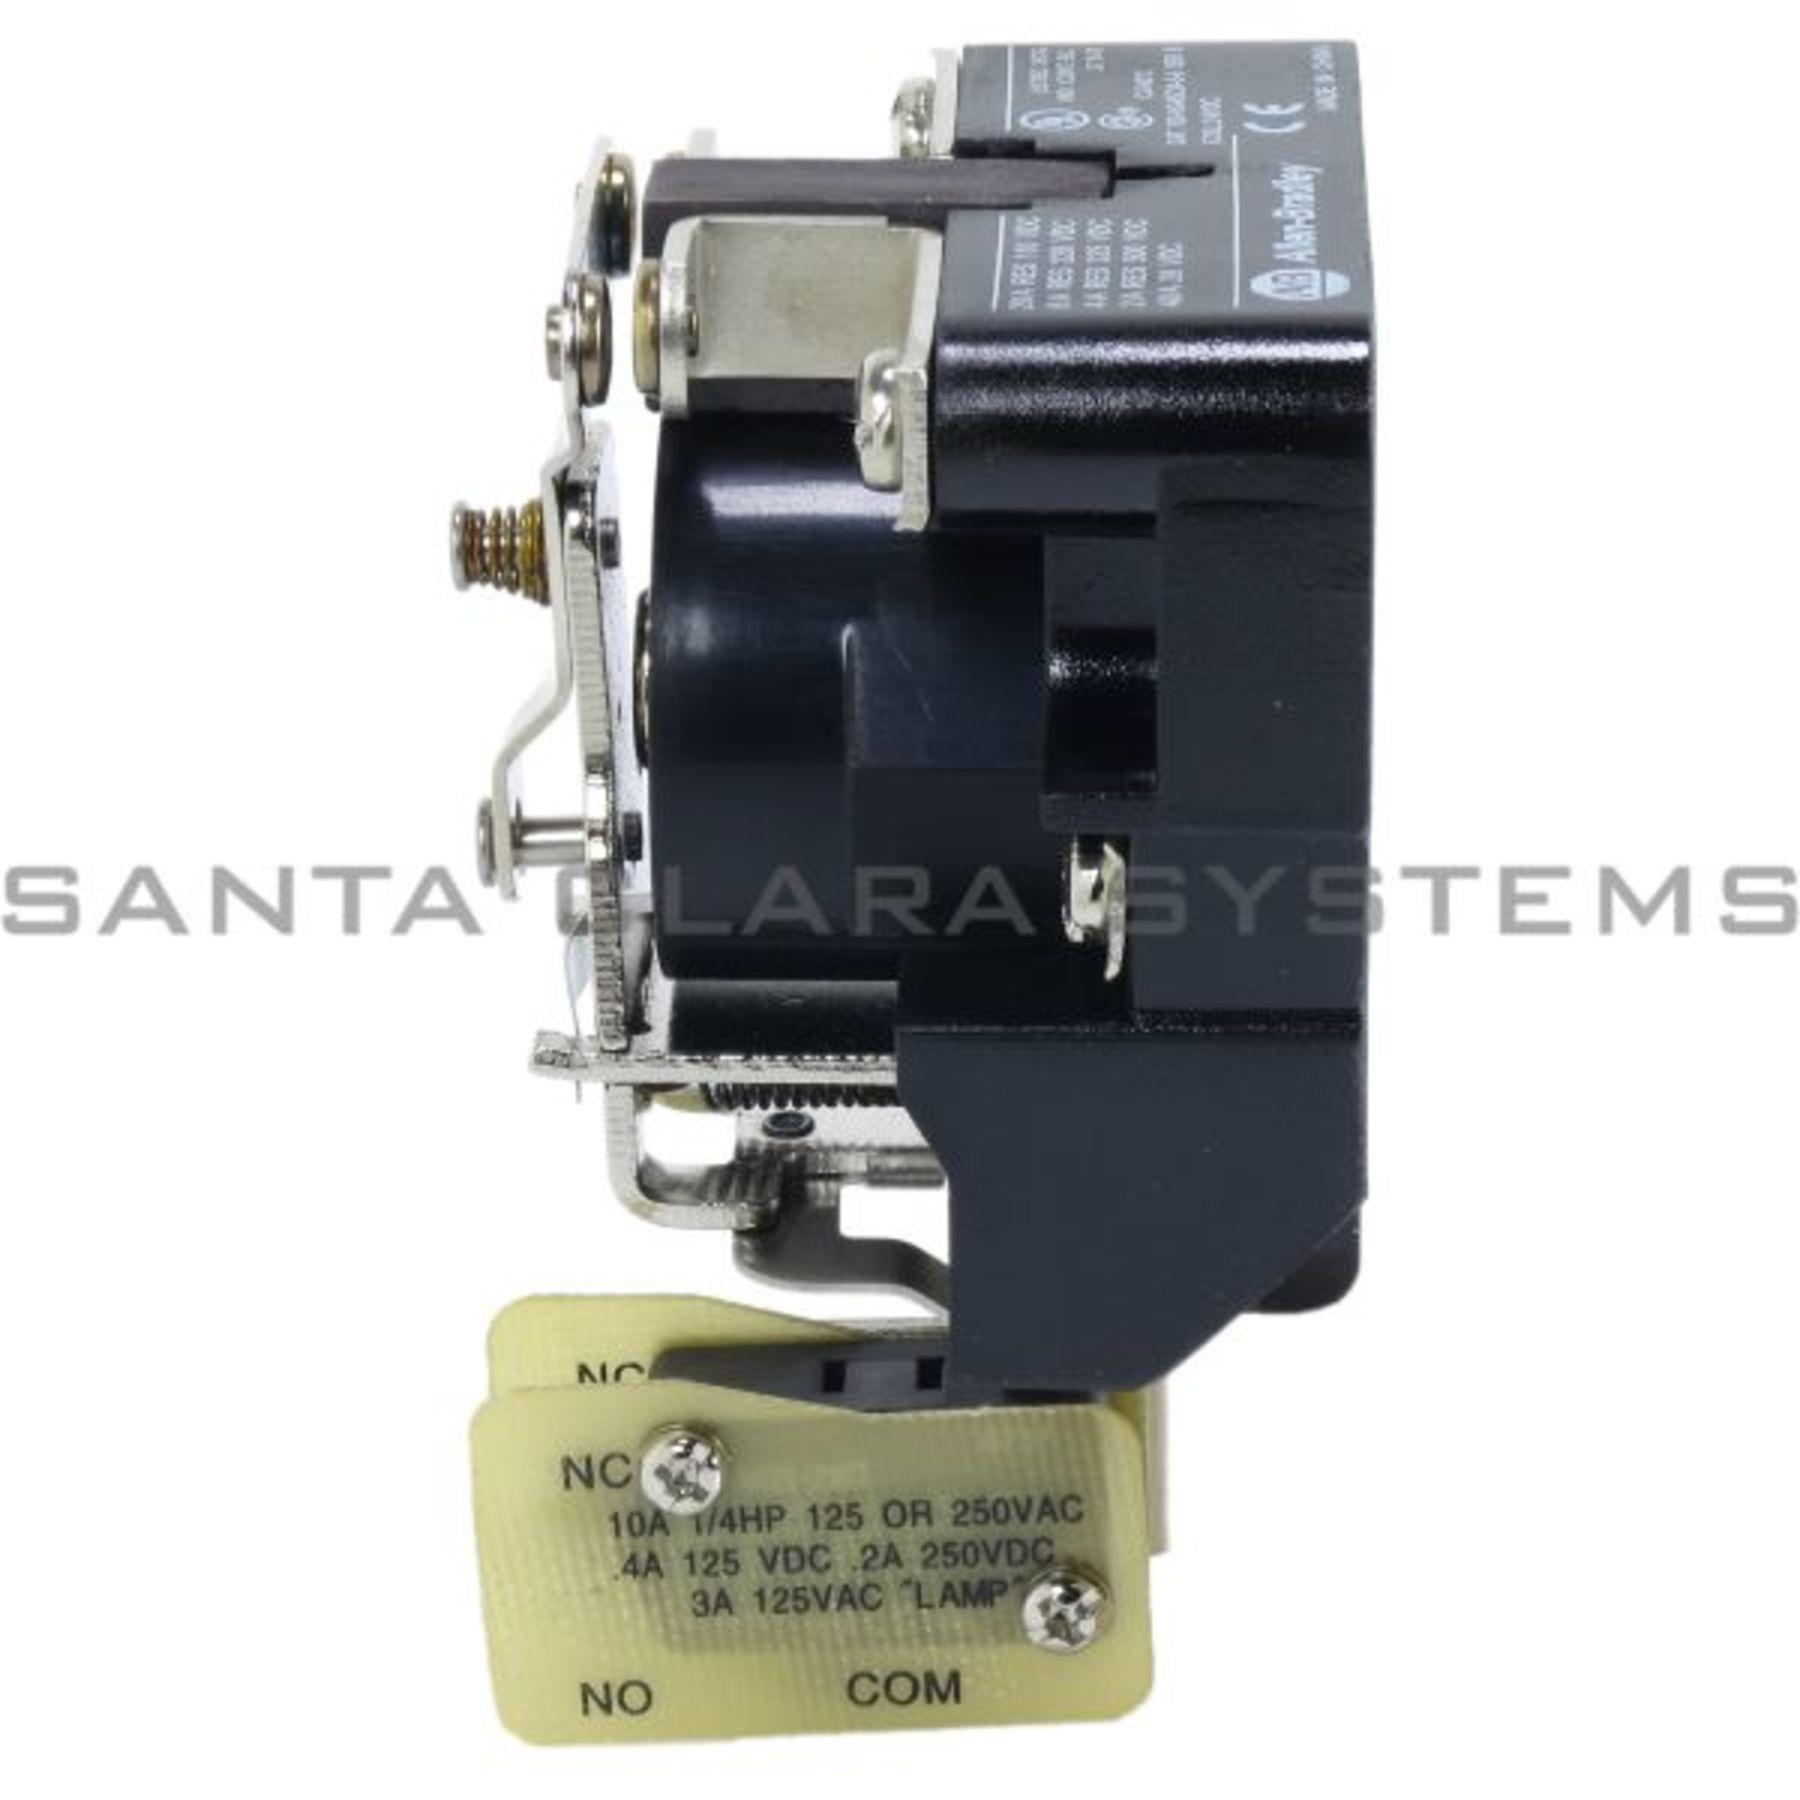 700 Hg45z24 5 6 Power Relay Allen Bradley In Stock Santa Clara Systems Switch Product Image